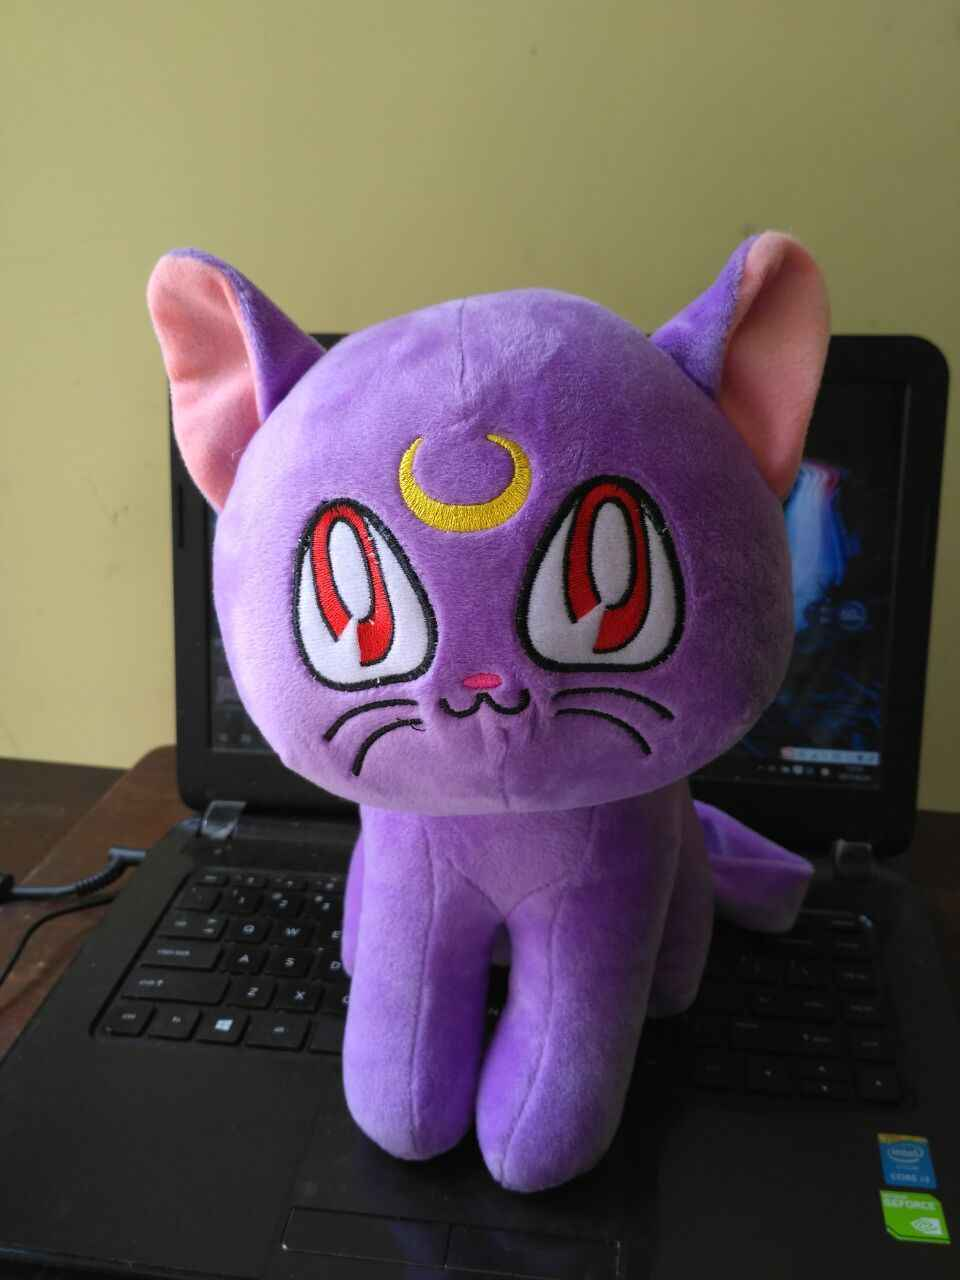 Movies & TV Sailormoon 33 cm Khá Soldier Sailor Moon Tím mèo Diana luna mèo plush toy doll gift p898